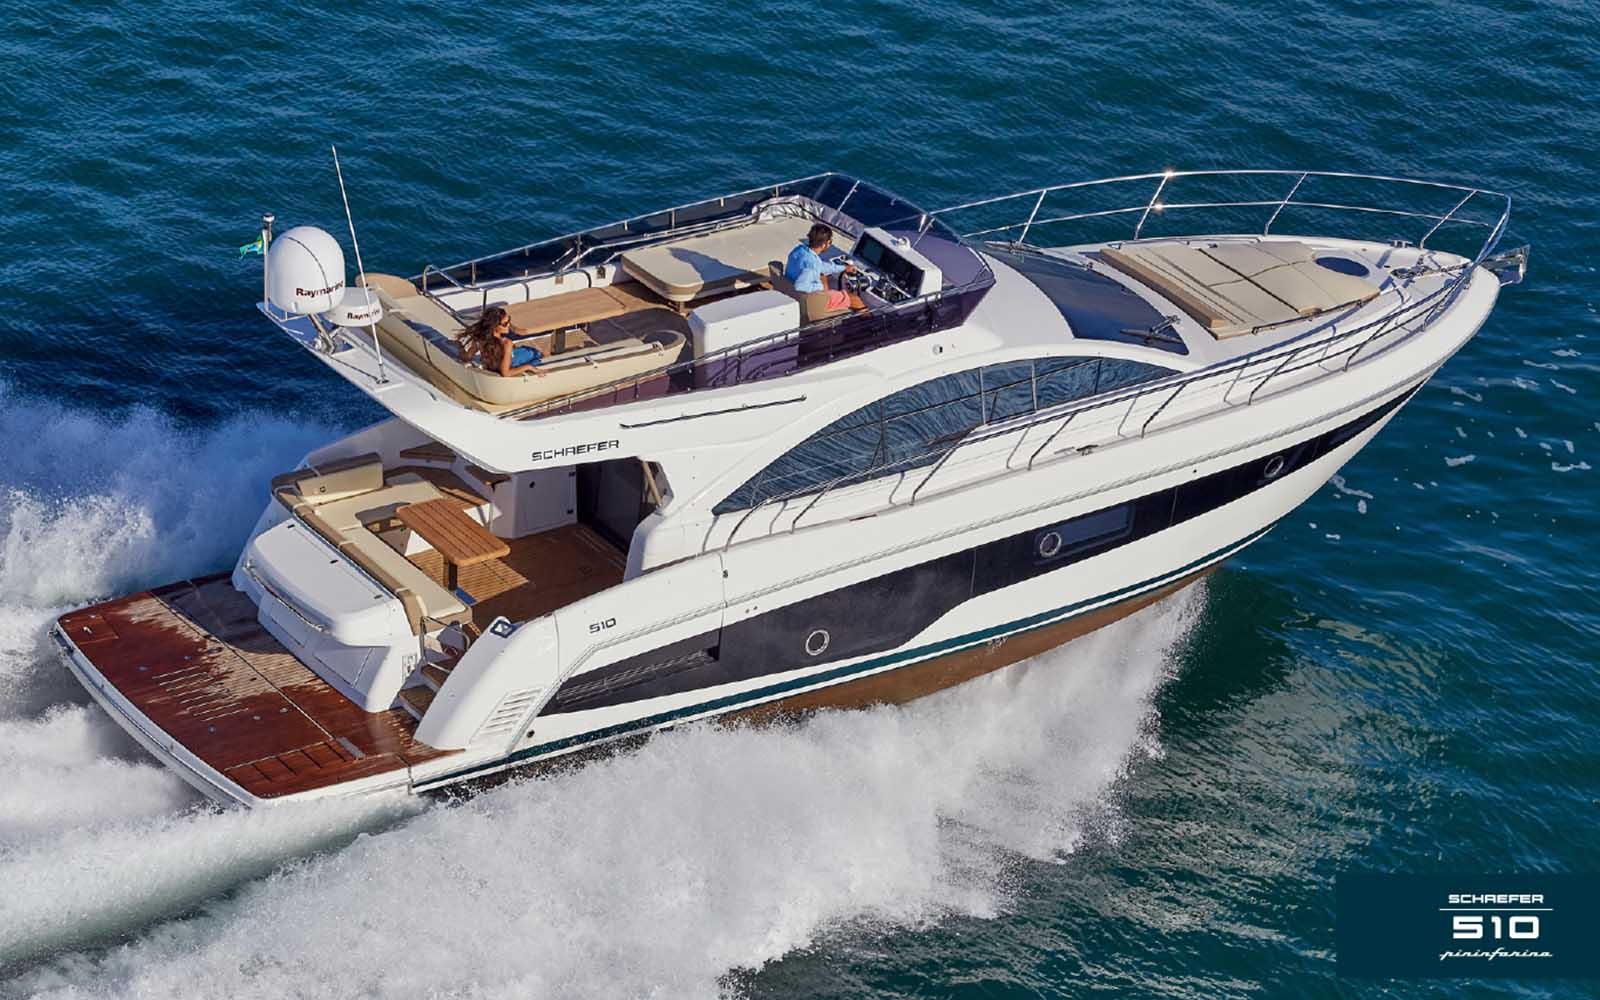 schaefer 510 pininfarina - boat shopping